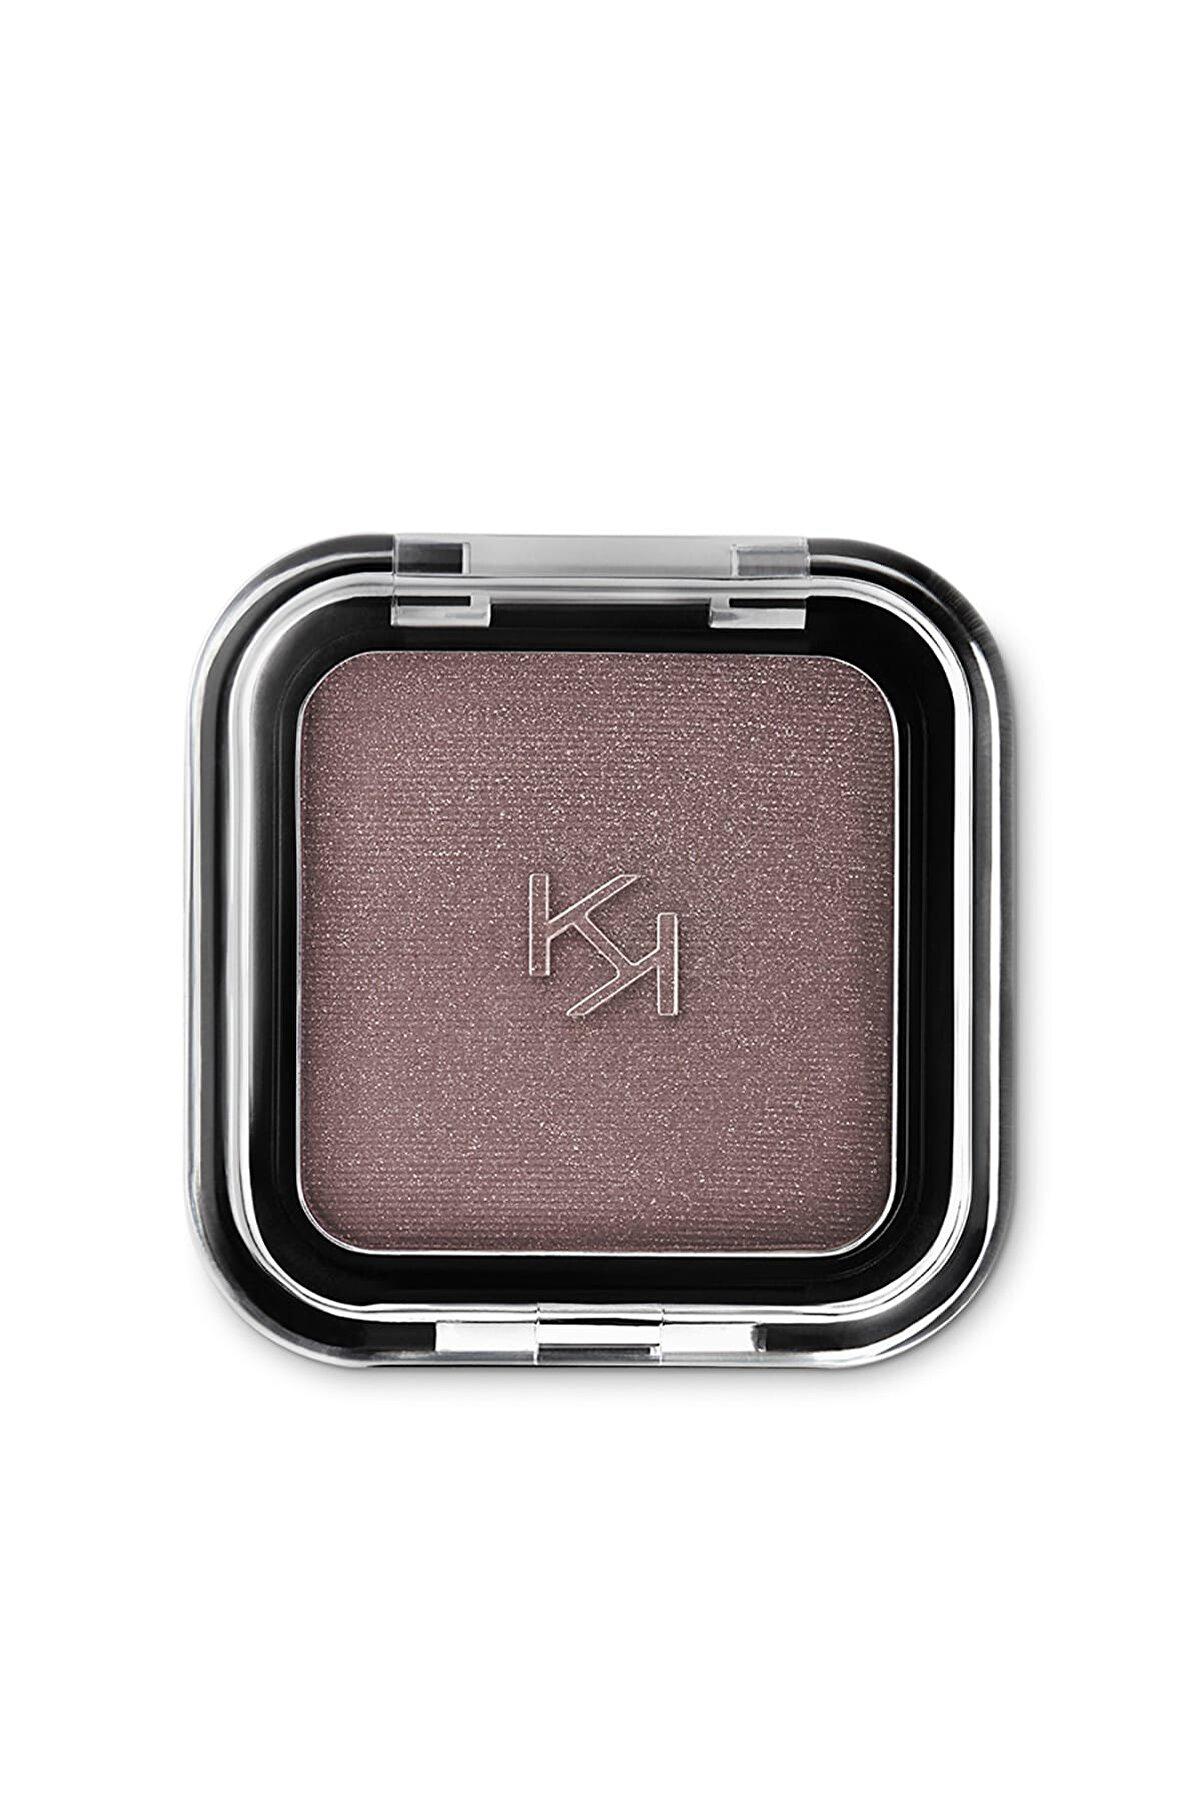 KIKO Göz Farı - Smart Colour Eyeshadow 08 Pearly Taupe 8025272620345